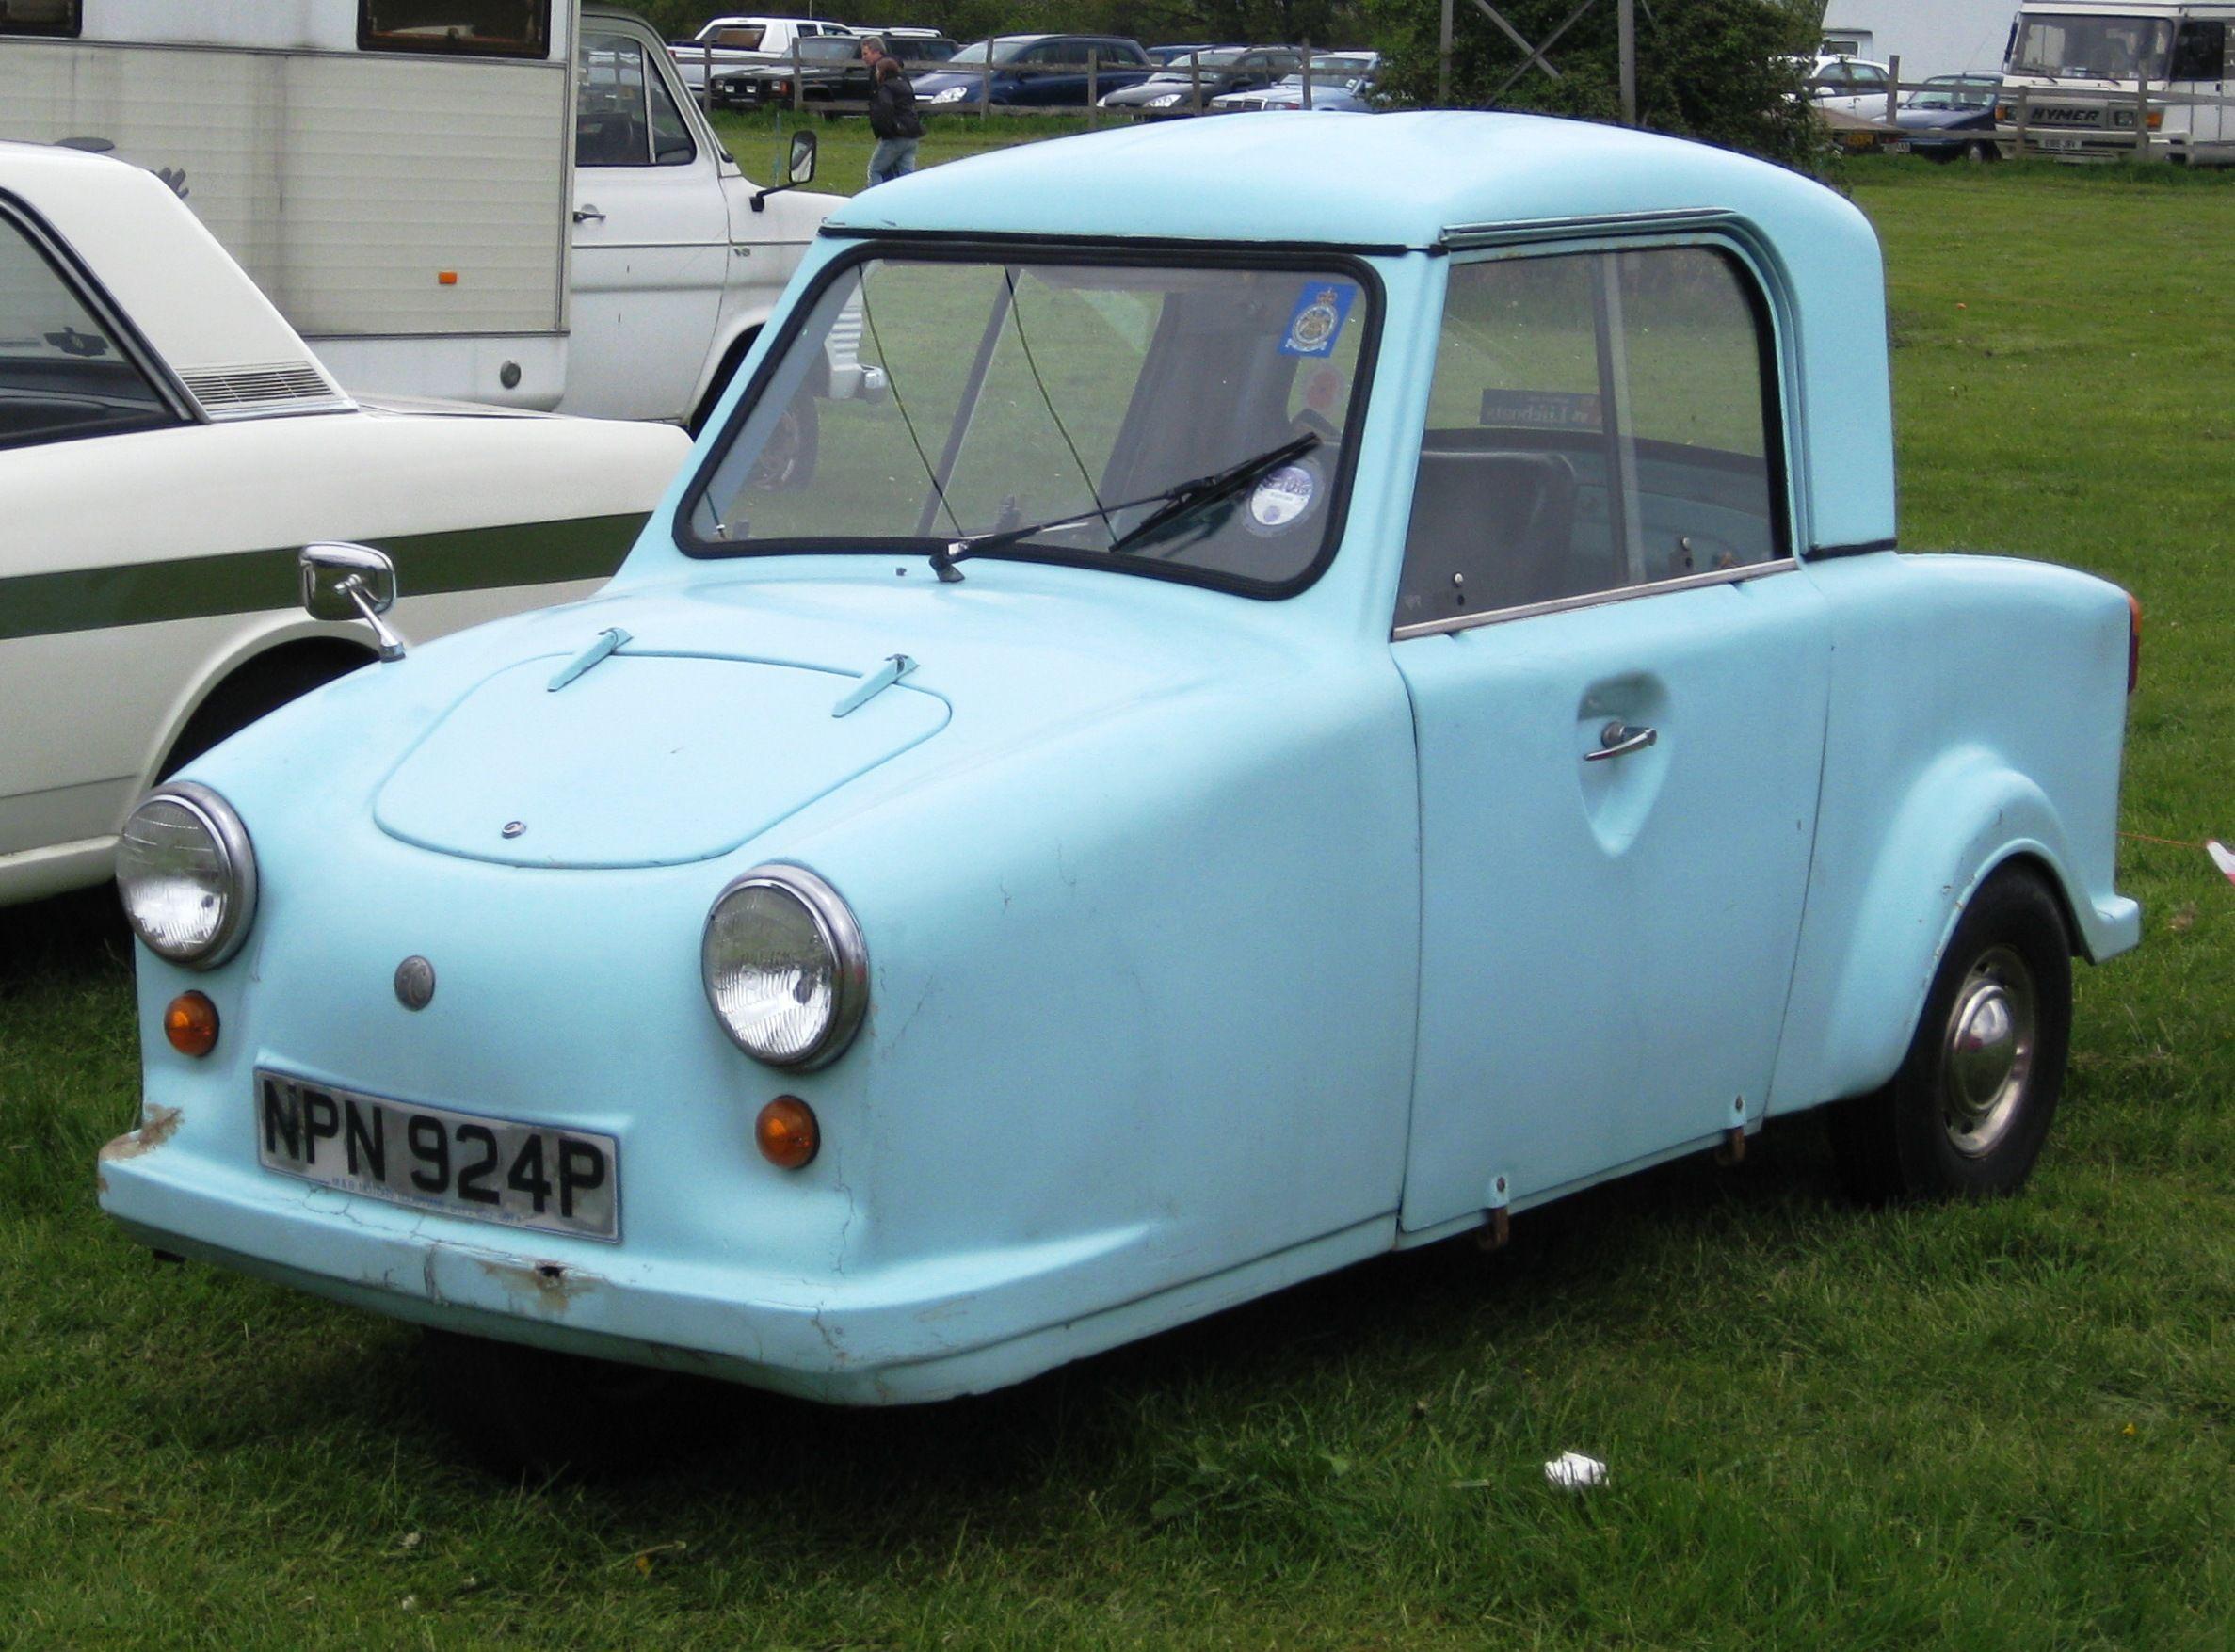 Charming Old Cars Wikipedia Ideas - Classic Cars Ideas - boiq.info